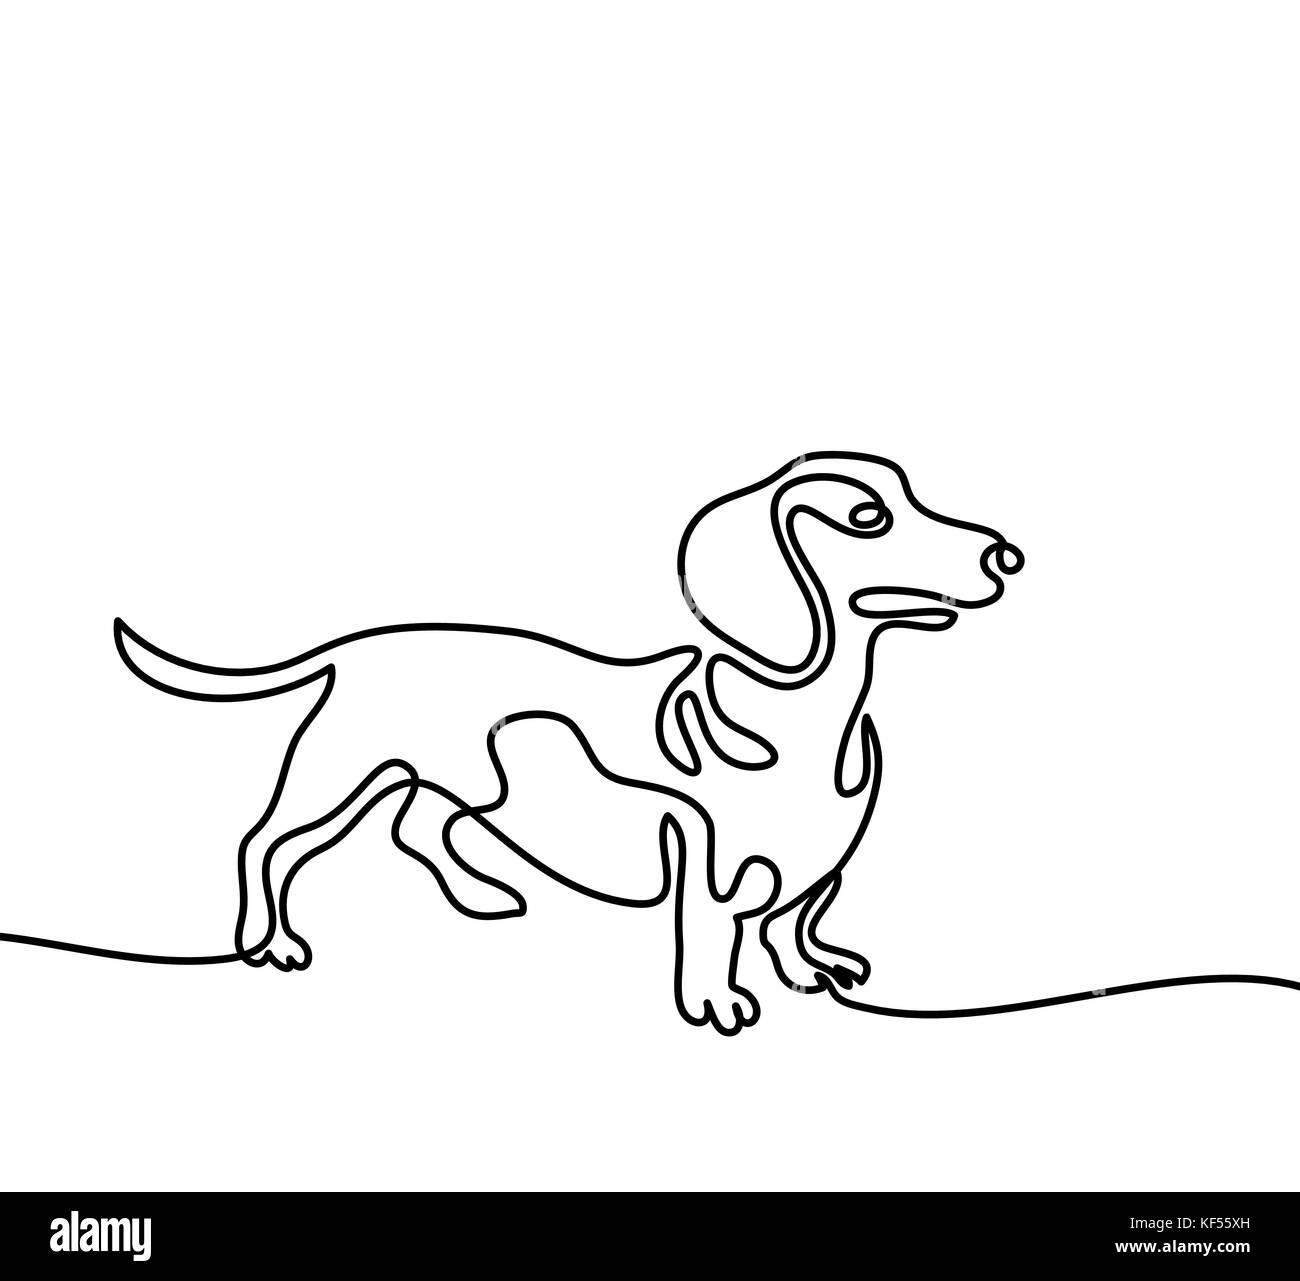 Line Drawing Dachshund : Dachshund dog drawing stock photos